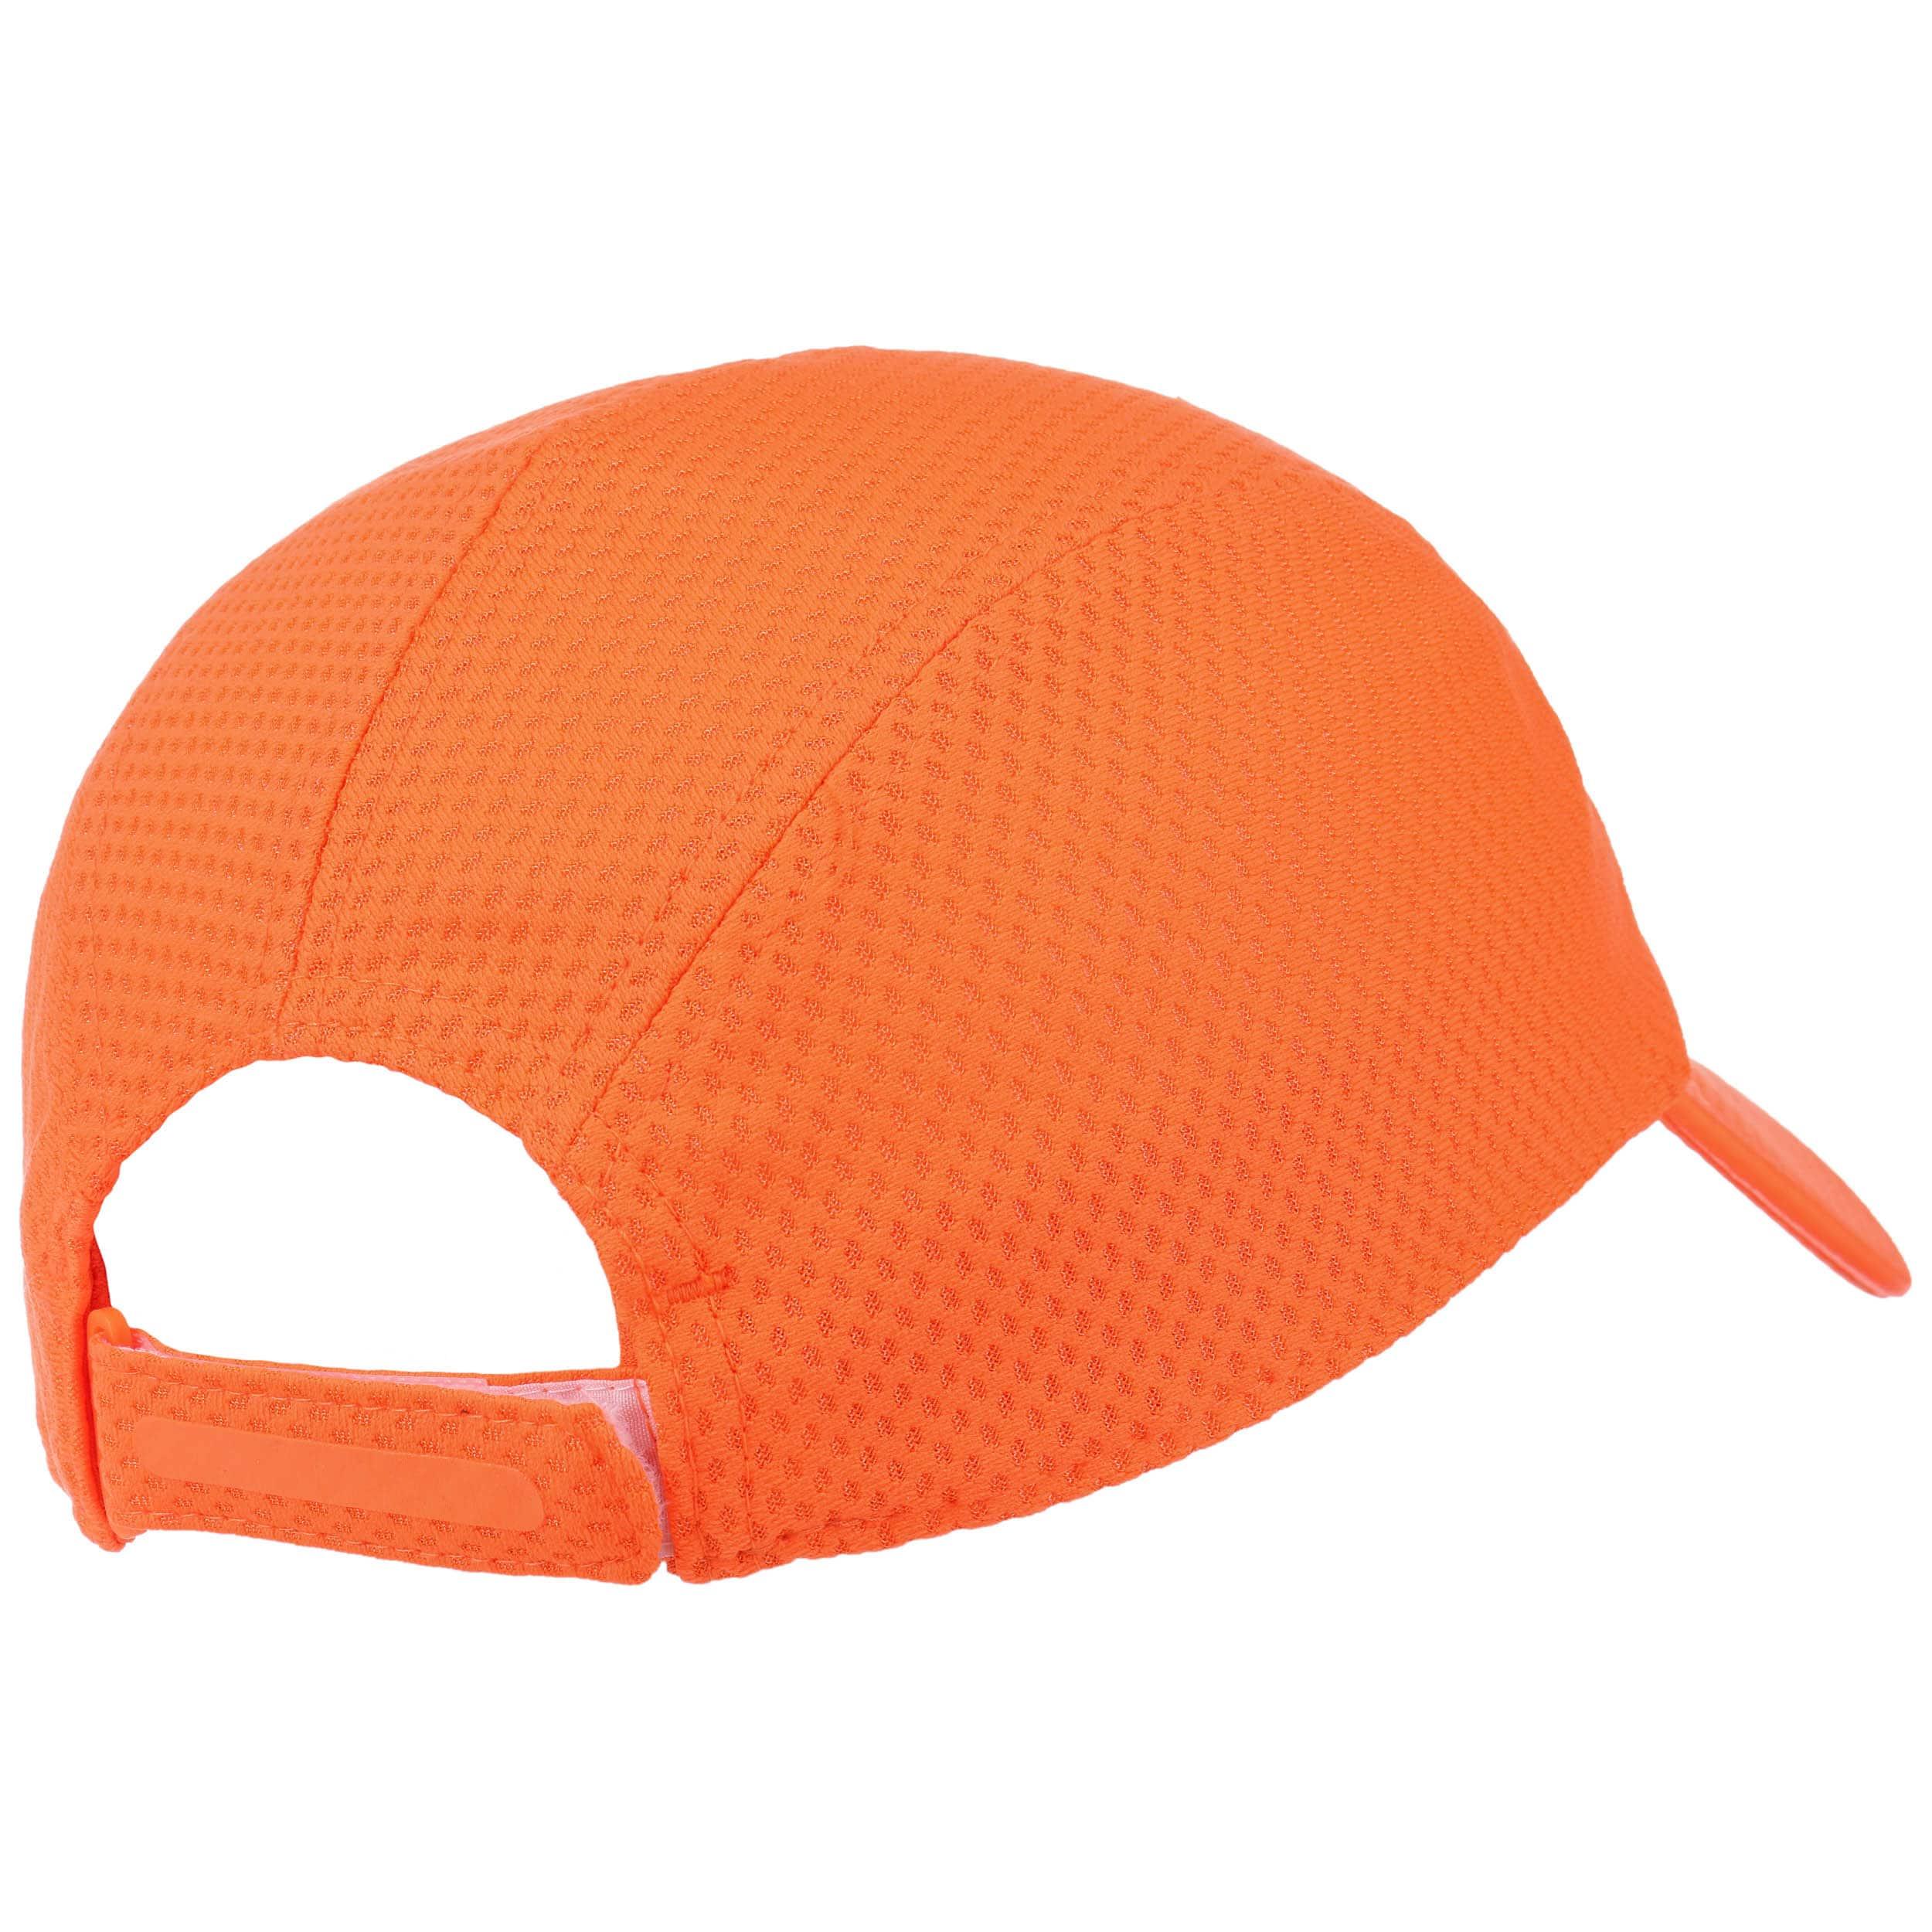 b23837e5686 ... white 2 · R96 Climacool Cap by adidas - orange 3 ...